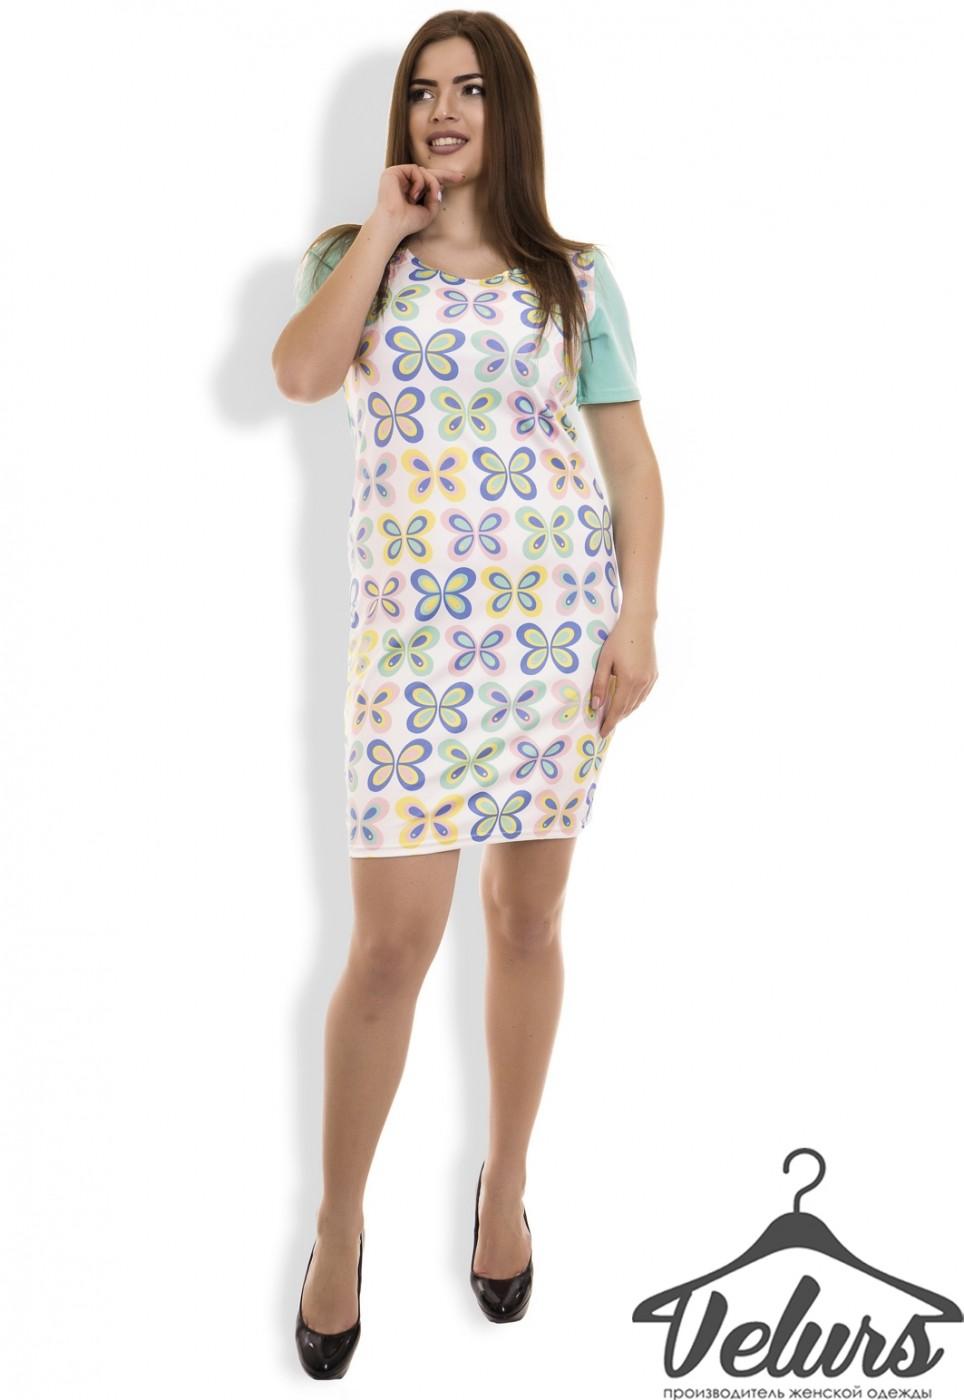 Velurs: Платье 212108 - фото 10